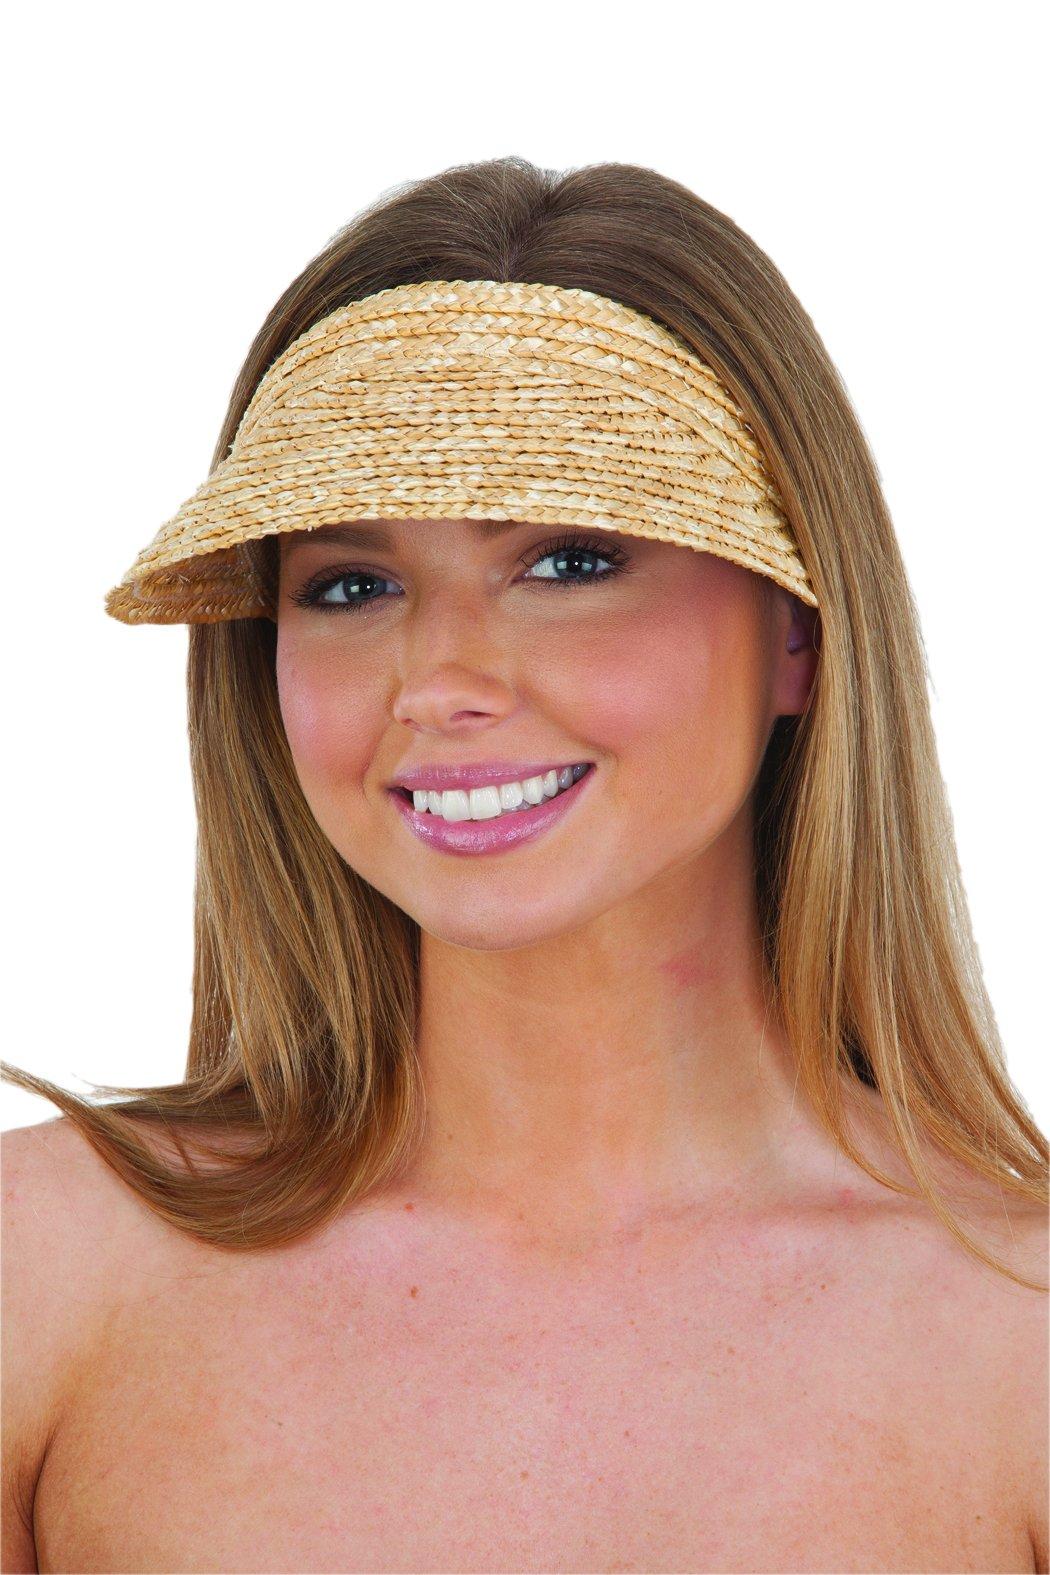 Jacobson Straw Hat - Slip On Braid Visor Tan Adult